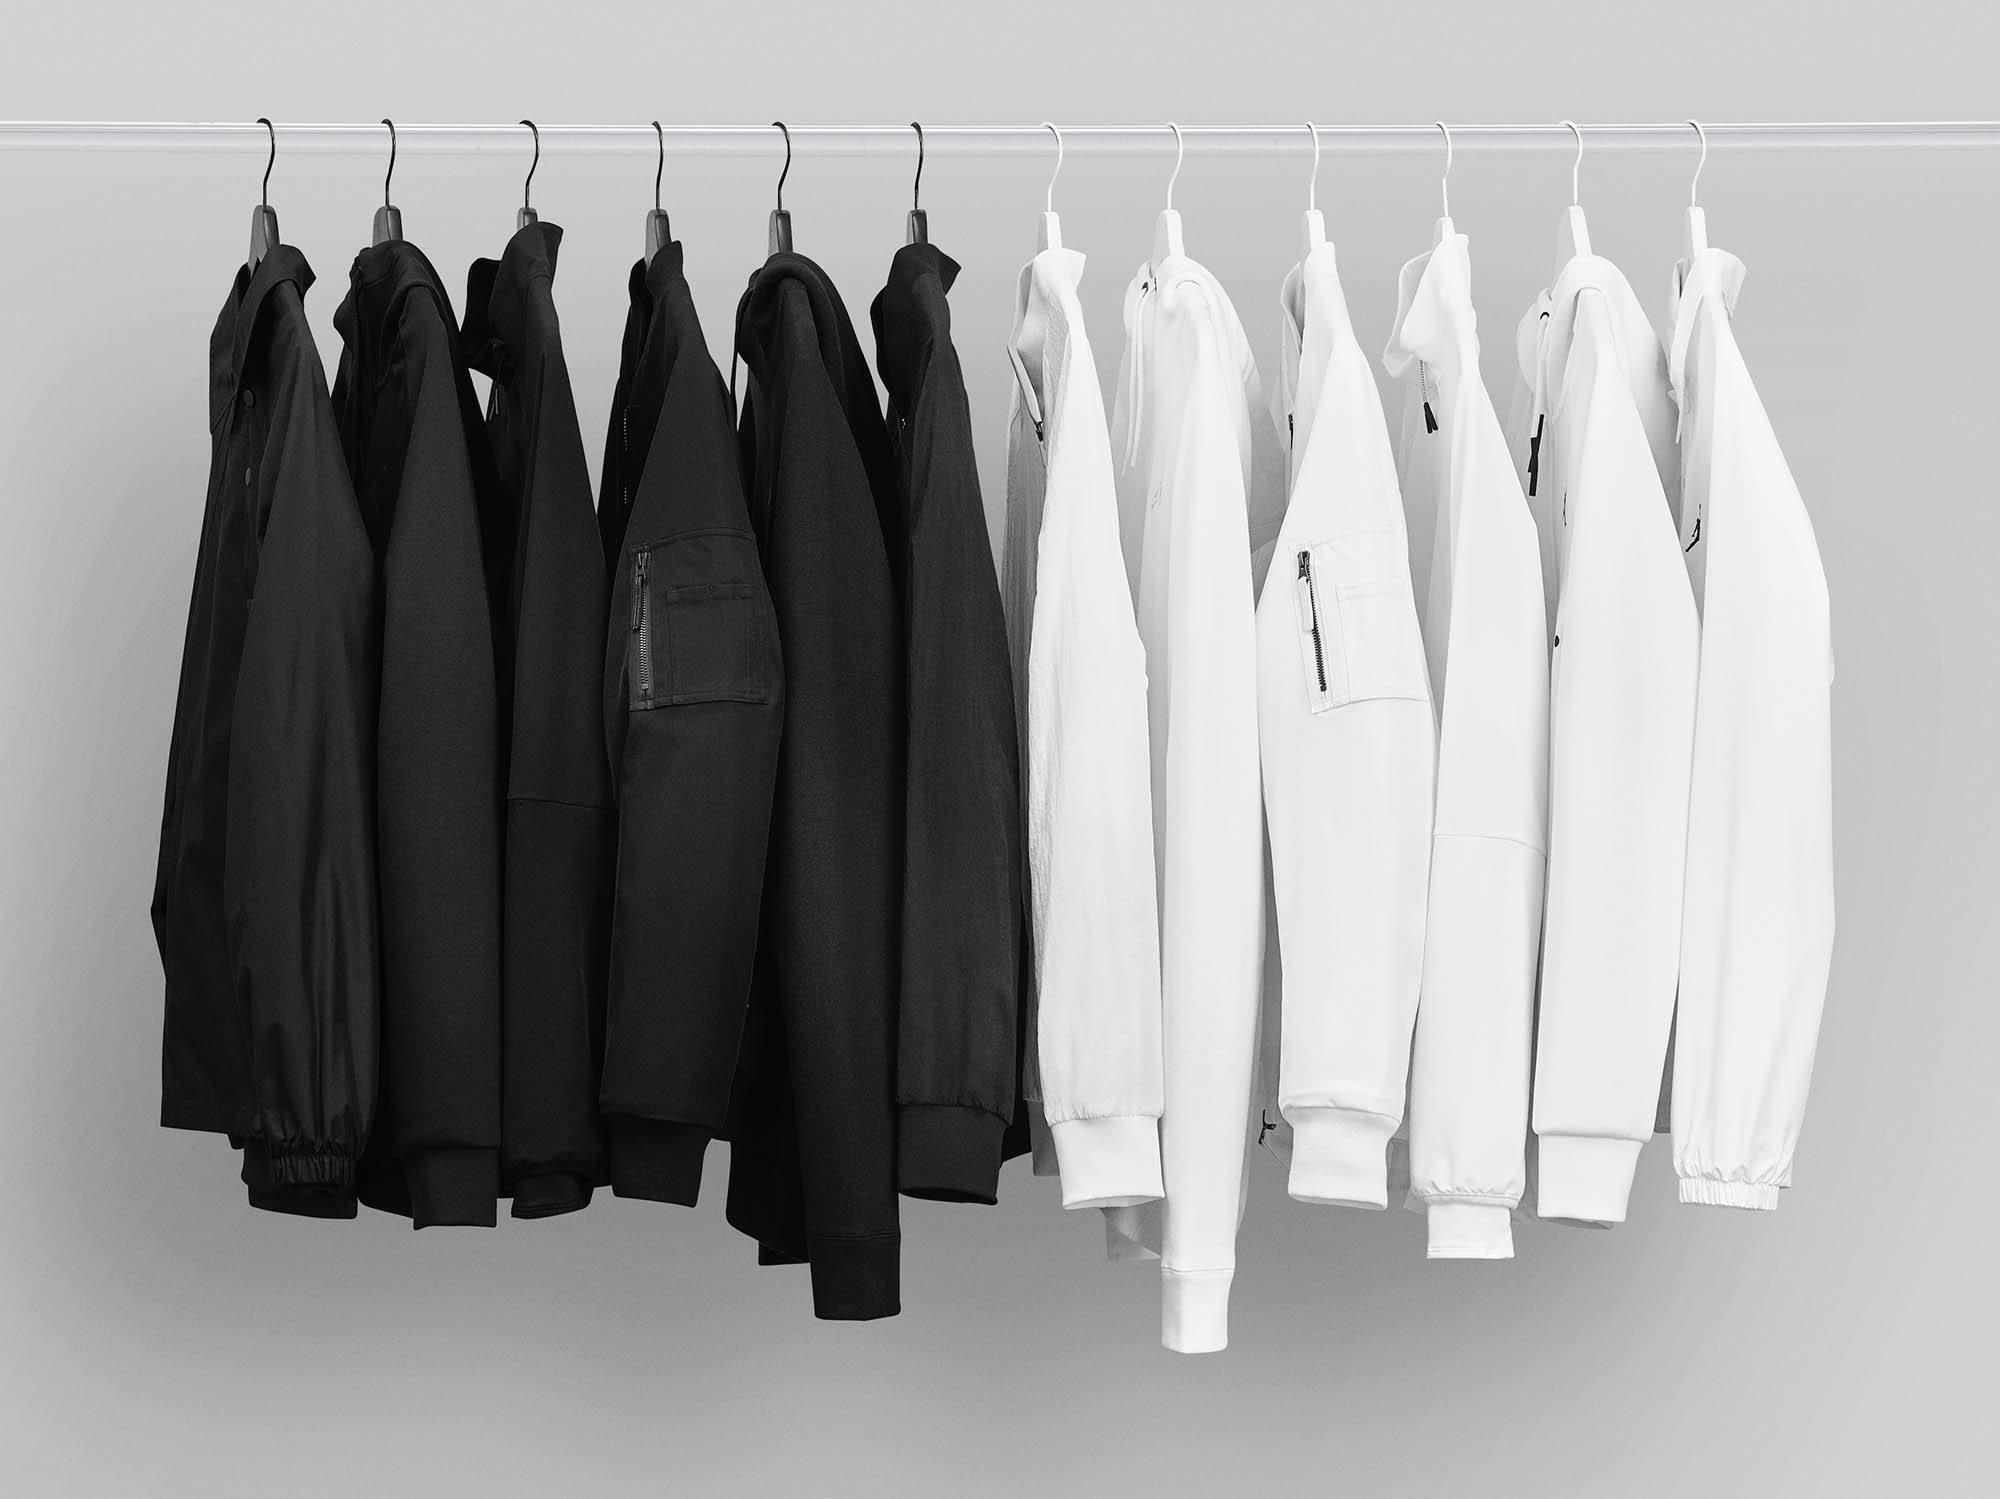 jordan-brand-2017-aw-clothing-collection-008